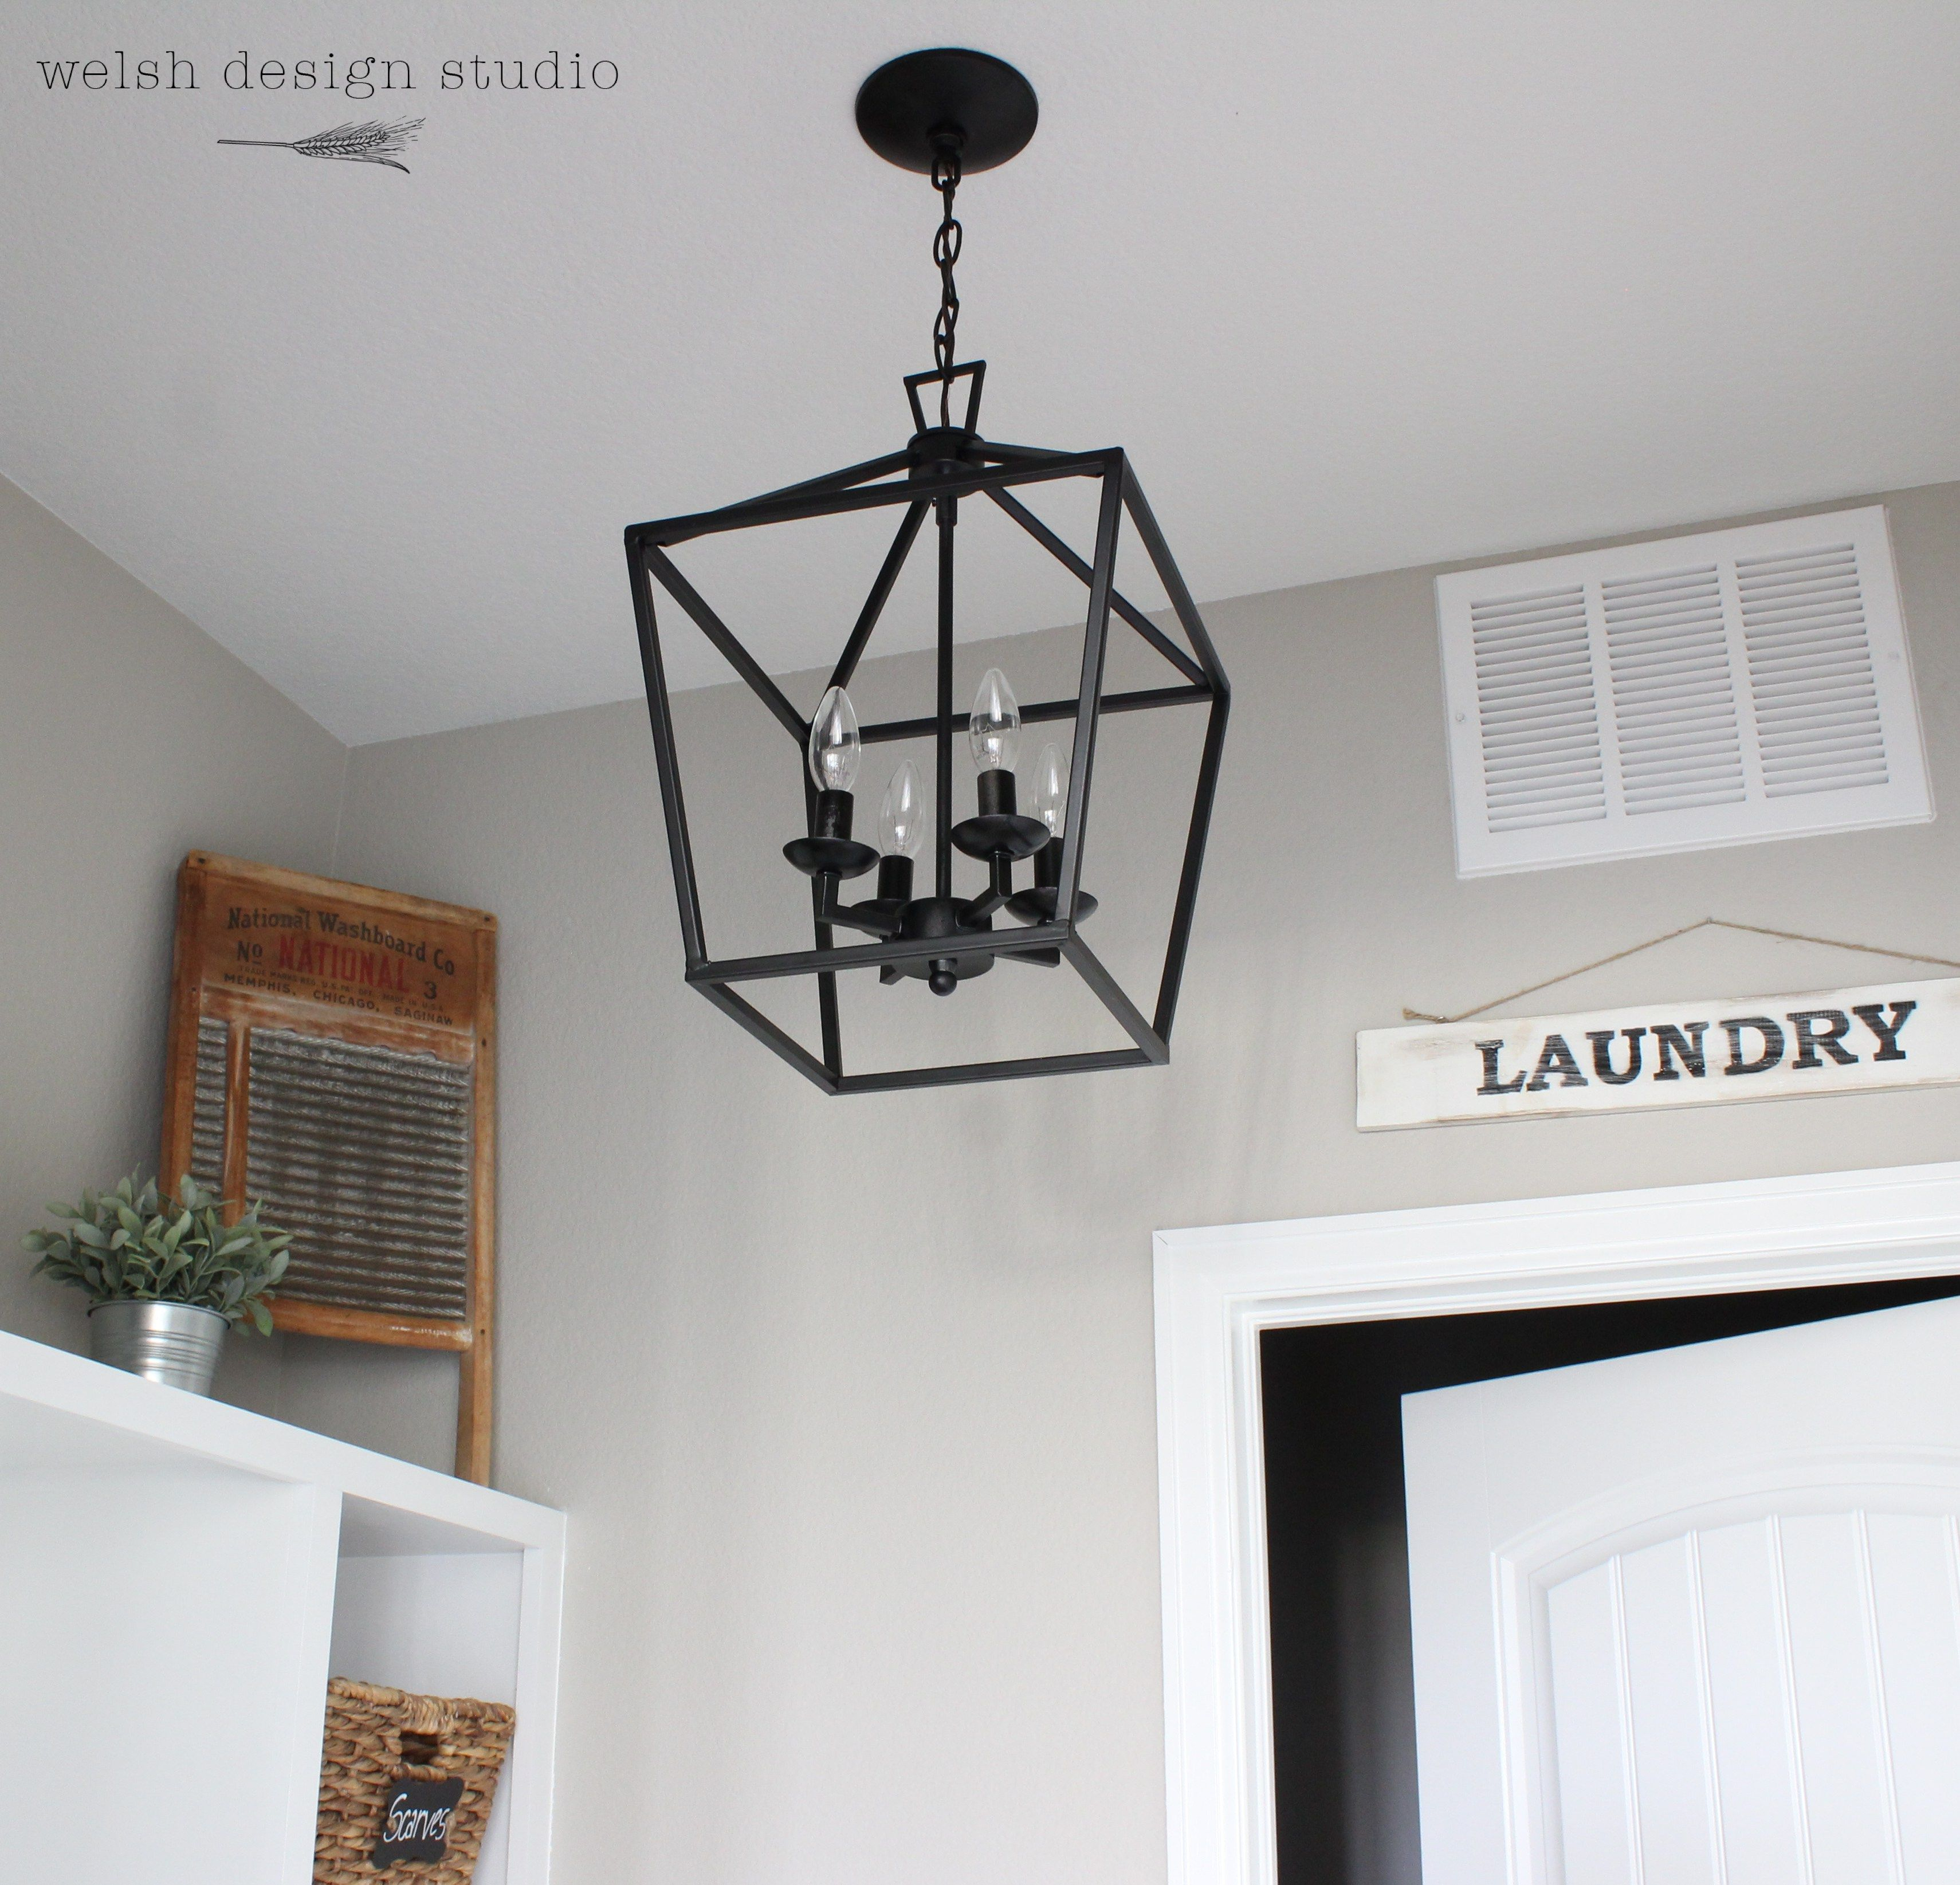 New Kitchen Pendant Lights & Mudroom Light | Laundry Room pertaining to Clematite 1-Light Single Jar Pendants (Image 22 of 30)